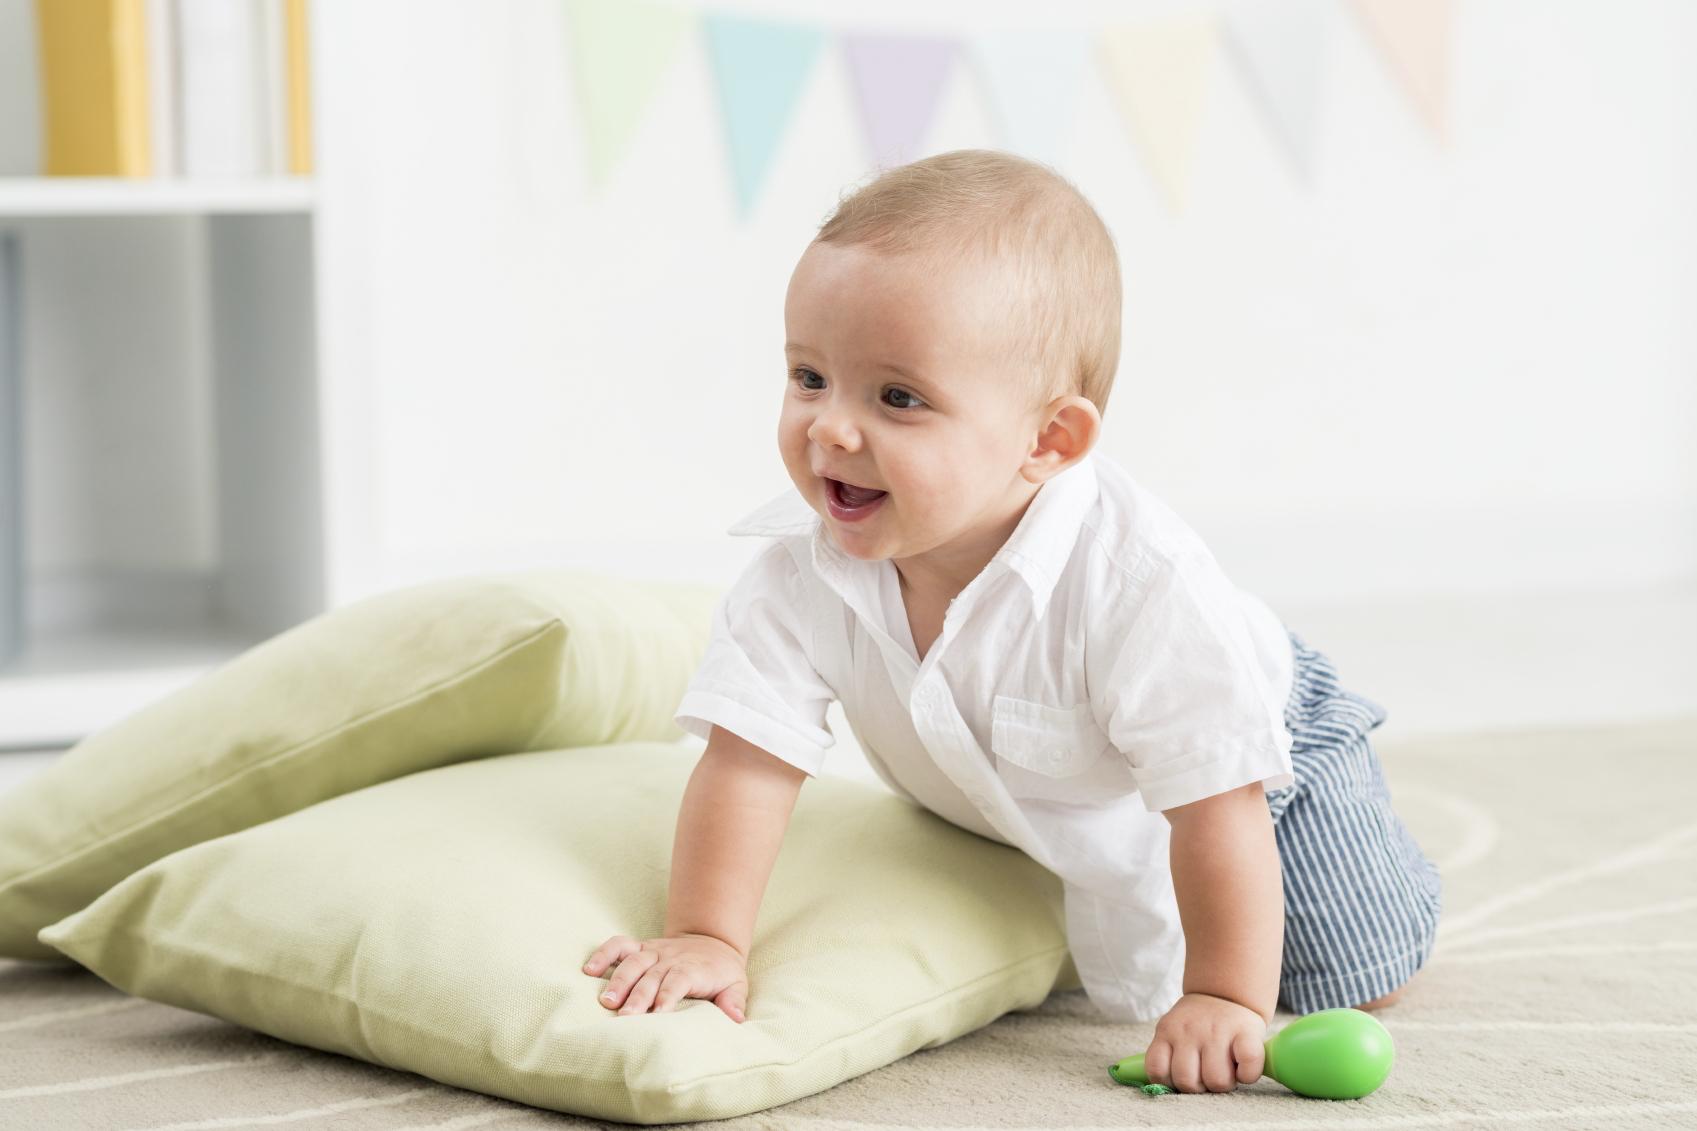 Kan det at svøbe barnet få konsekvenser for den motoriske udvikling?